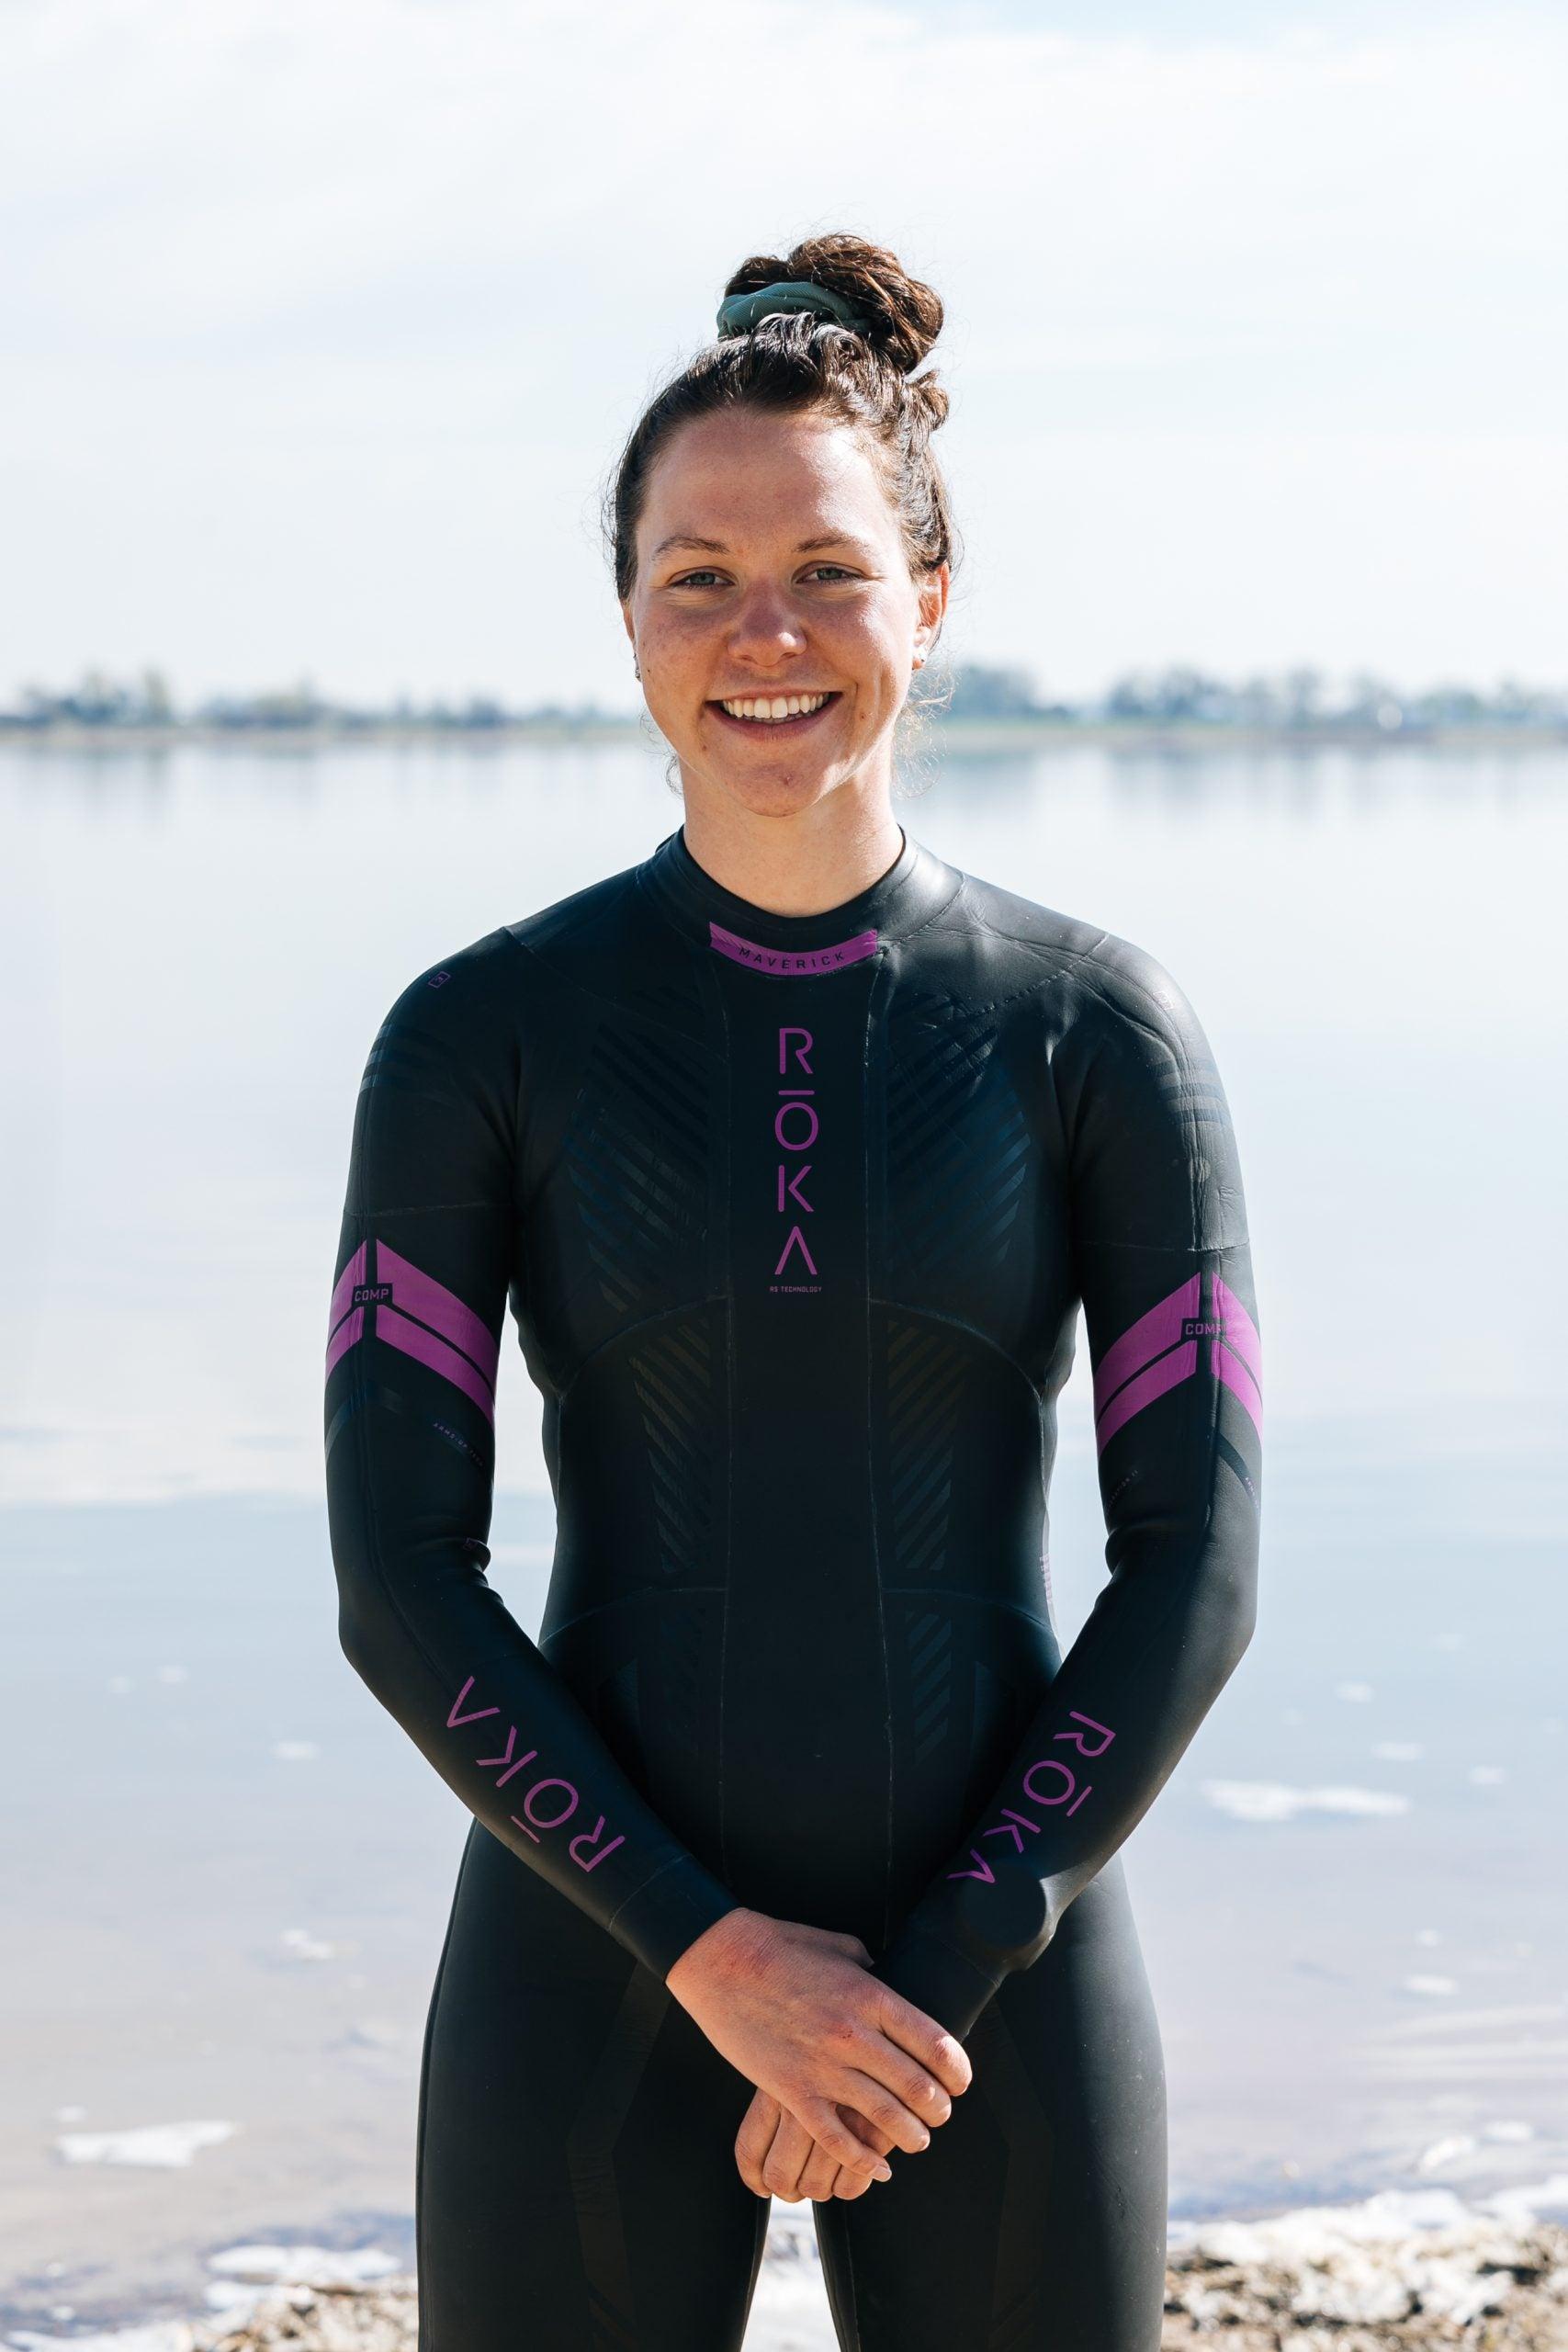 Maren York, CU Triathlon team